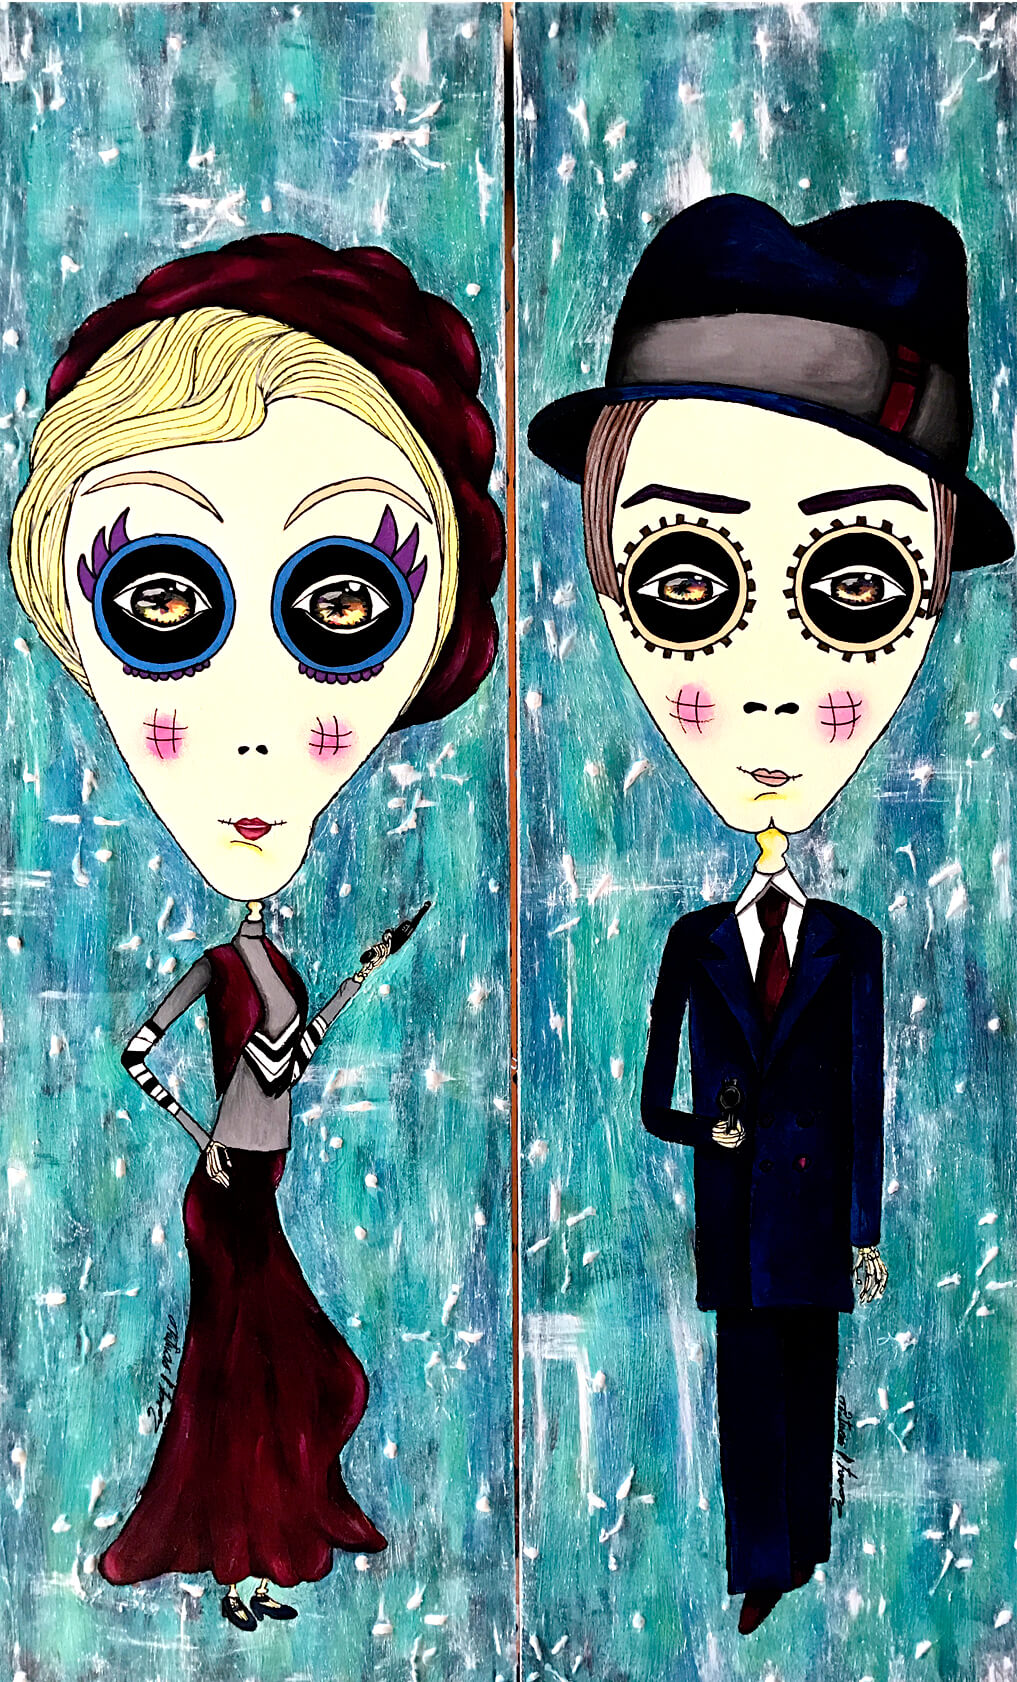 Miss Bonnie & Mister Clyde